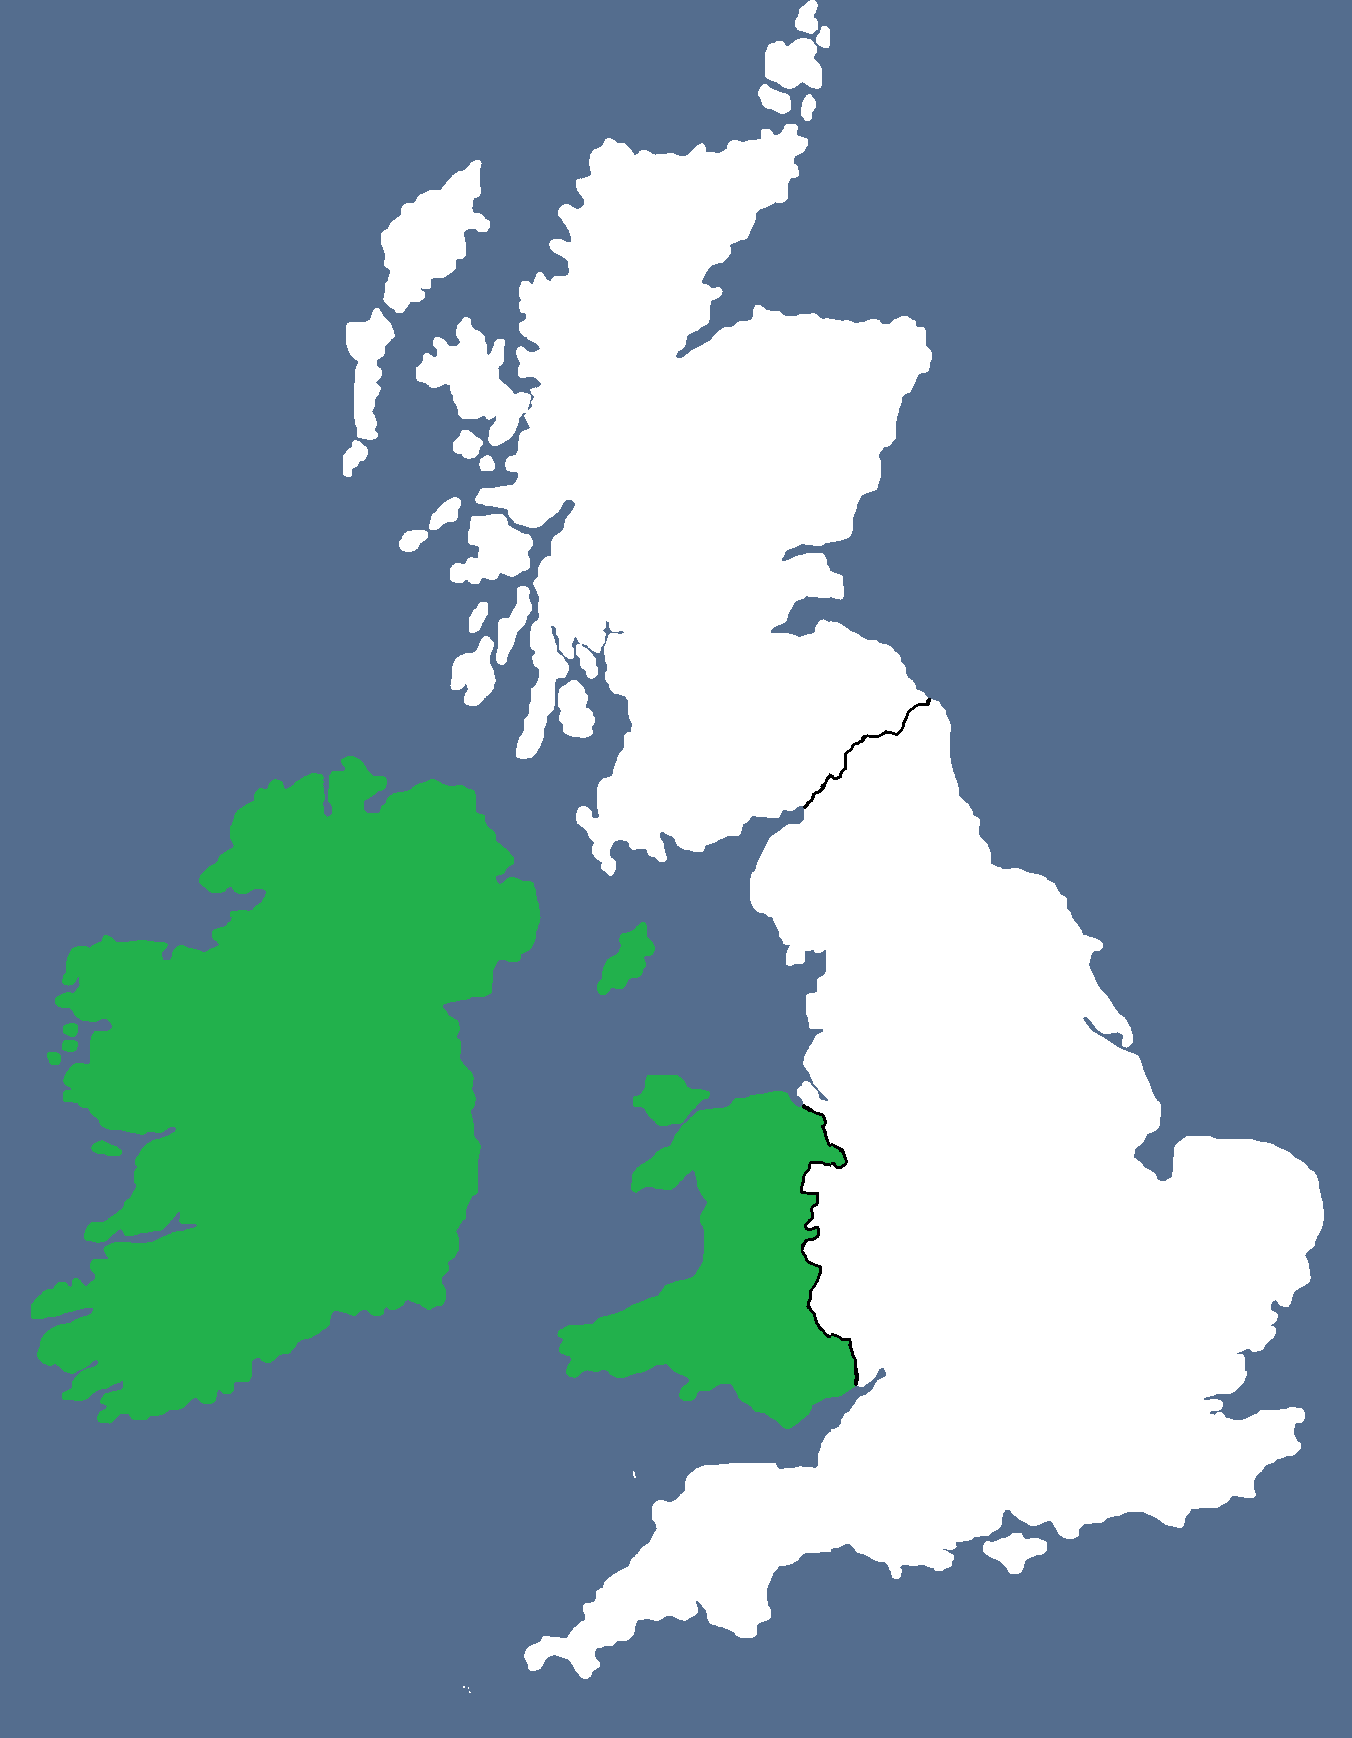 Image celtic union 2 greater europe map gameg alternative celtic union 2 greater europe map gameg gumiabroncs Images